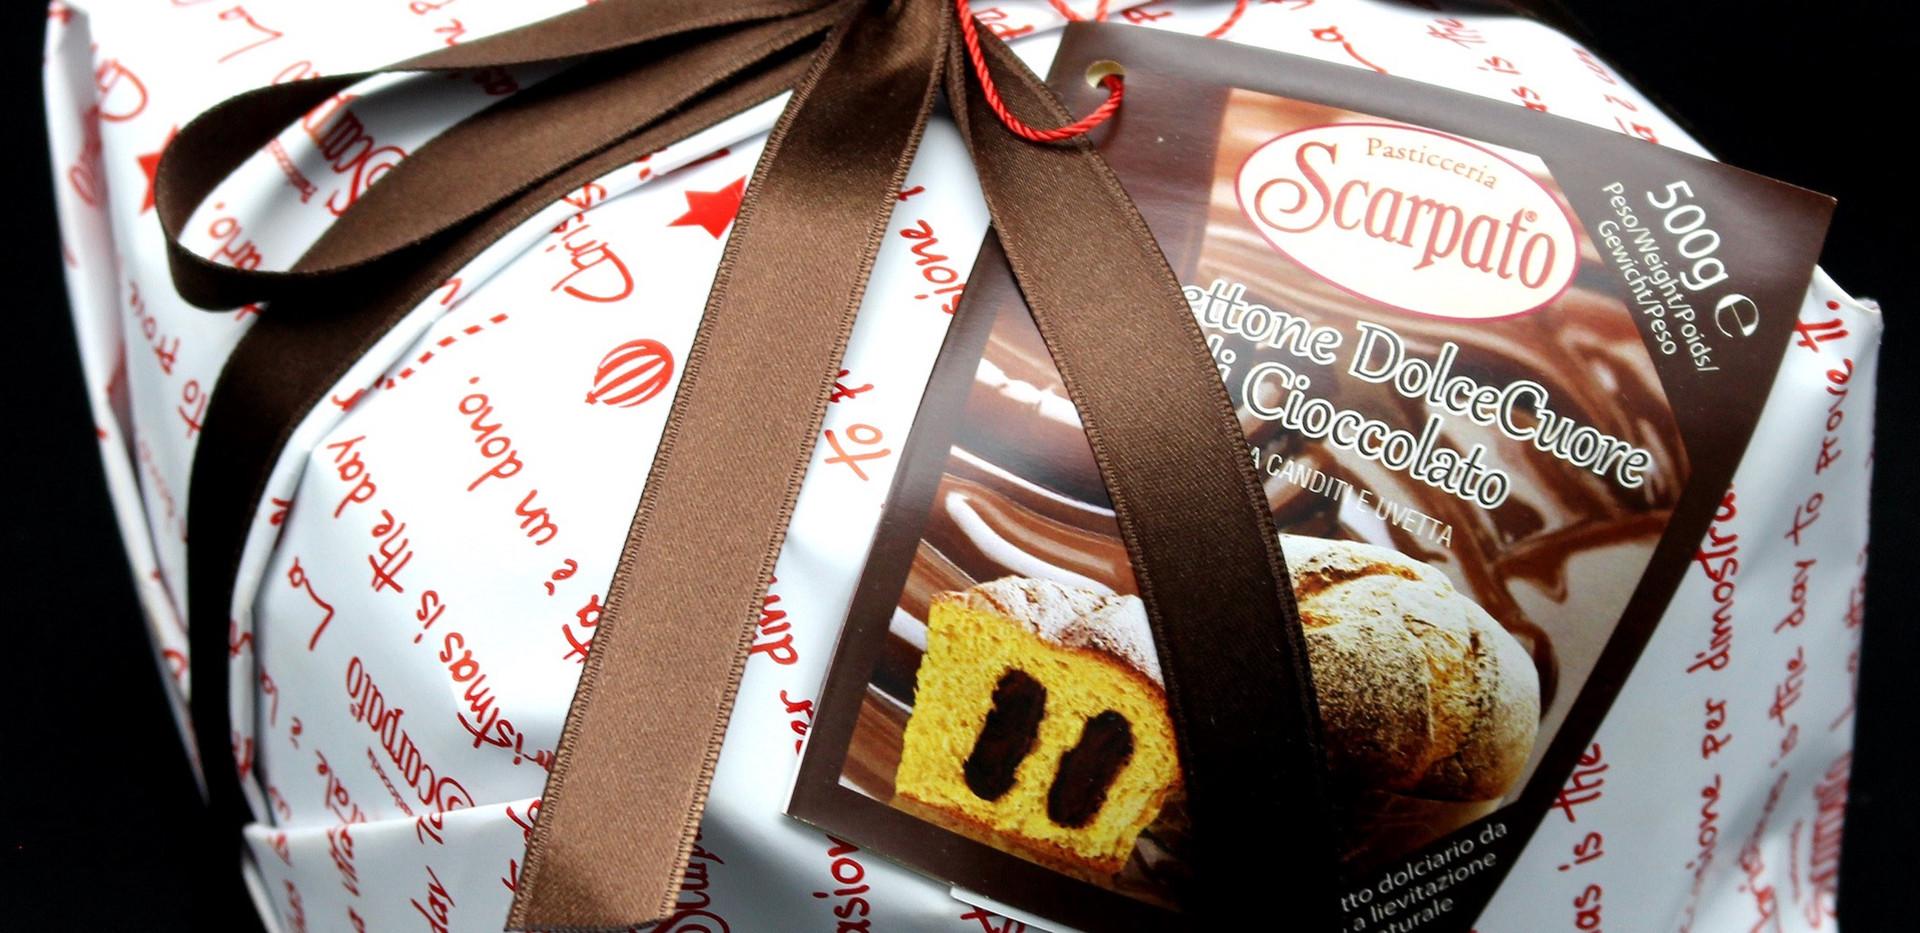 Panettone Coeur au Chocolat